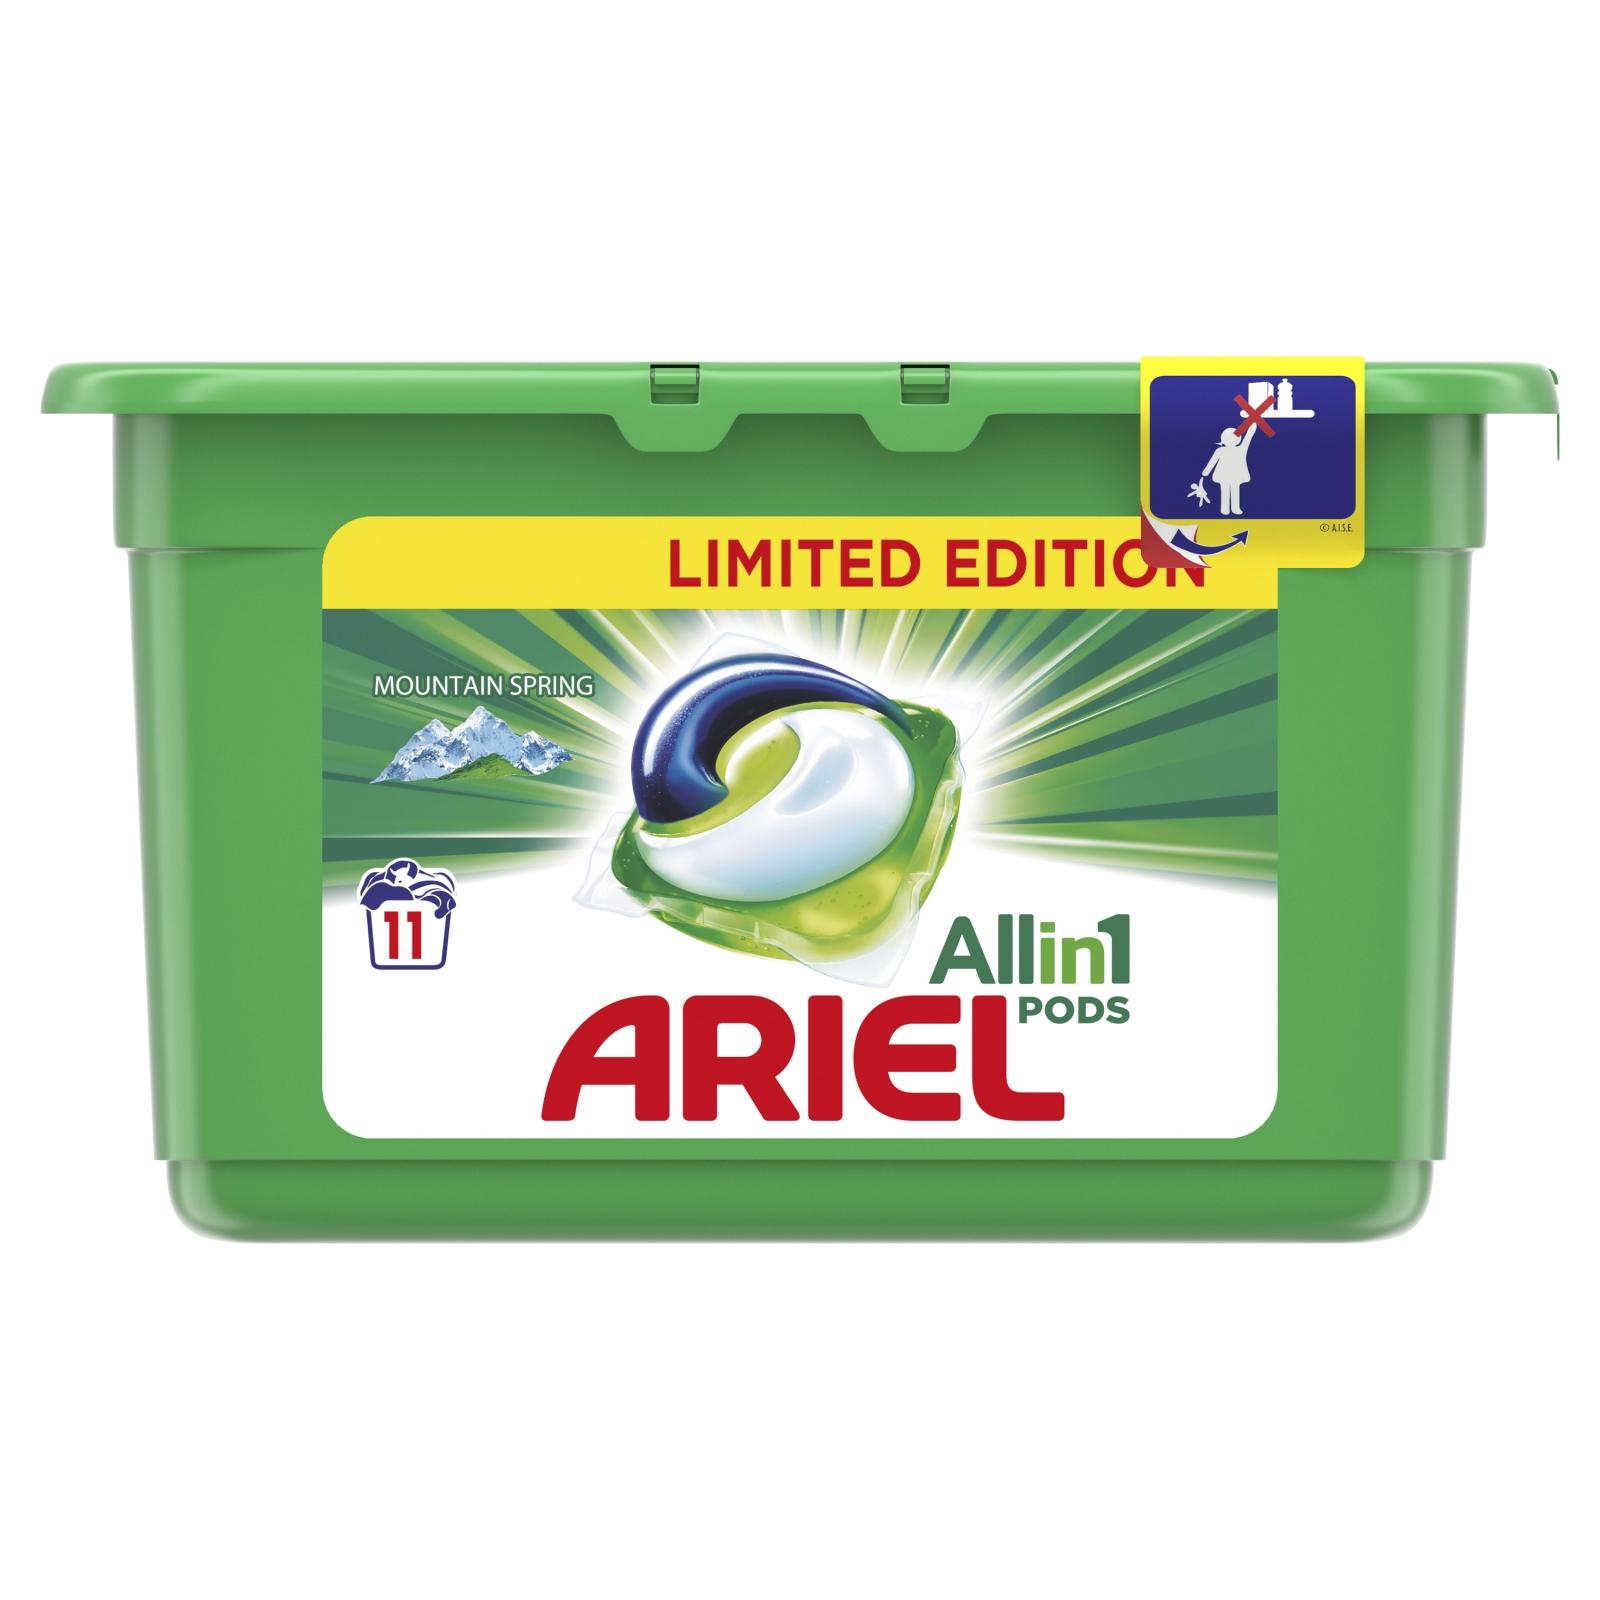 Ariel 3v1 Mountain Spring gelové kapsle na praní prádla 11 ks 297 g